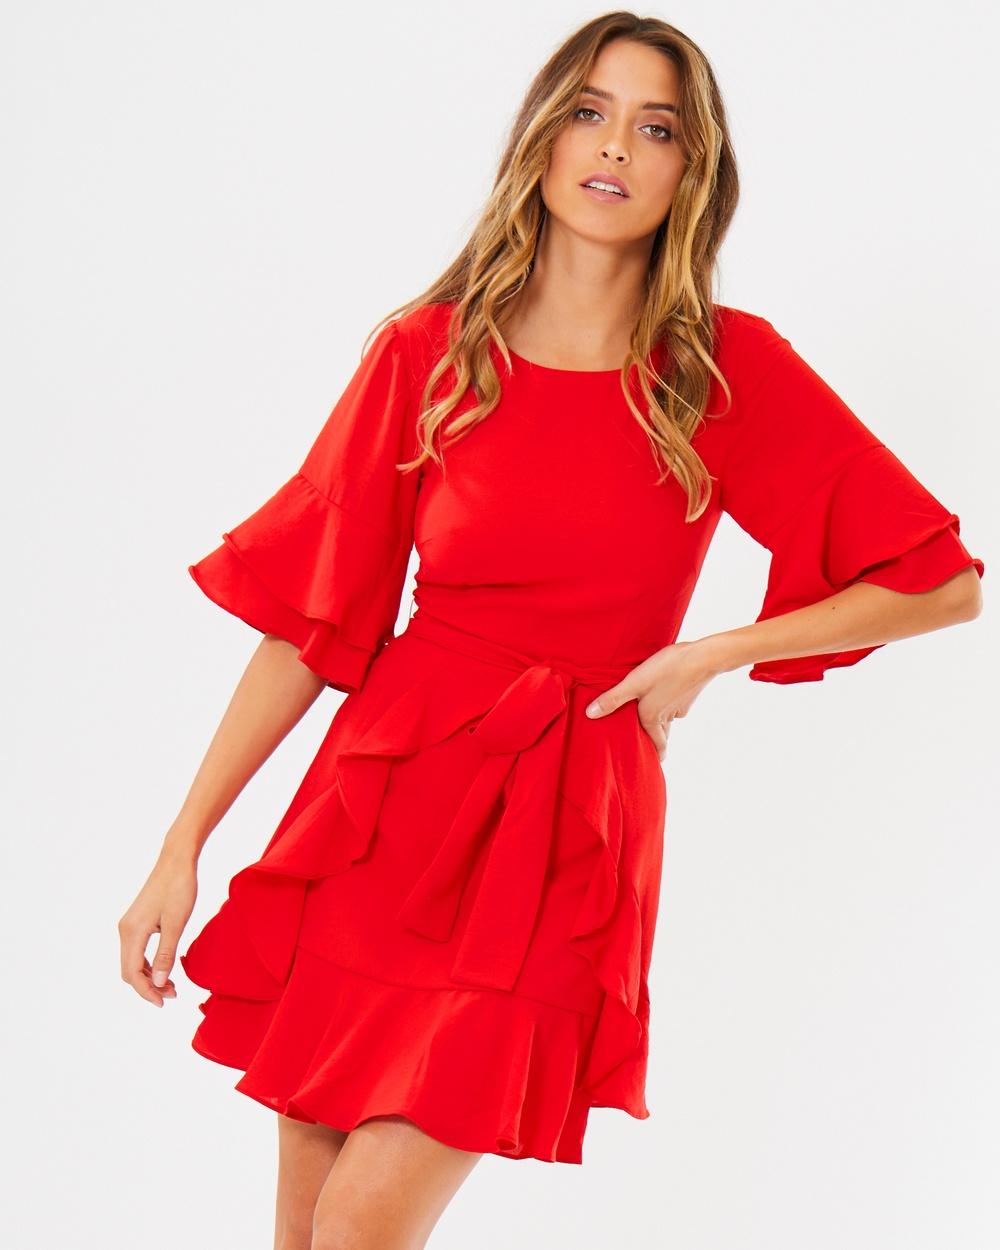 Tussah Cecilia Ruffle Dress Dresses Poppy Cecilia Ruffle Dress